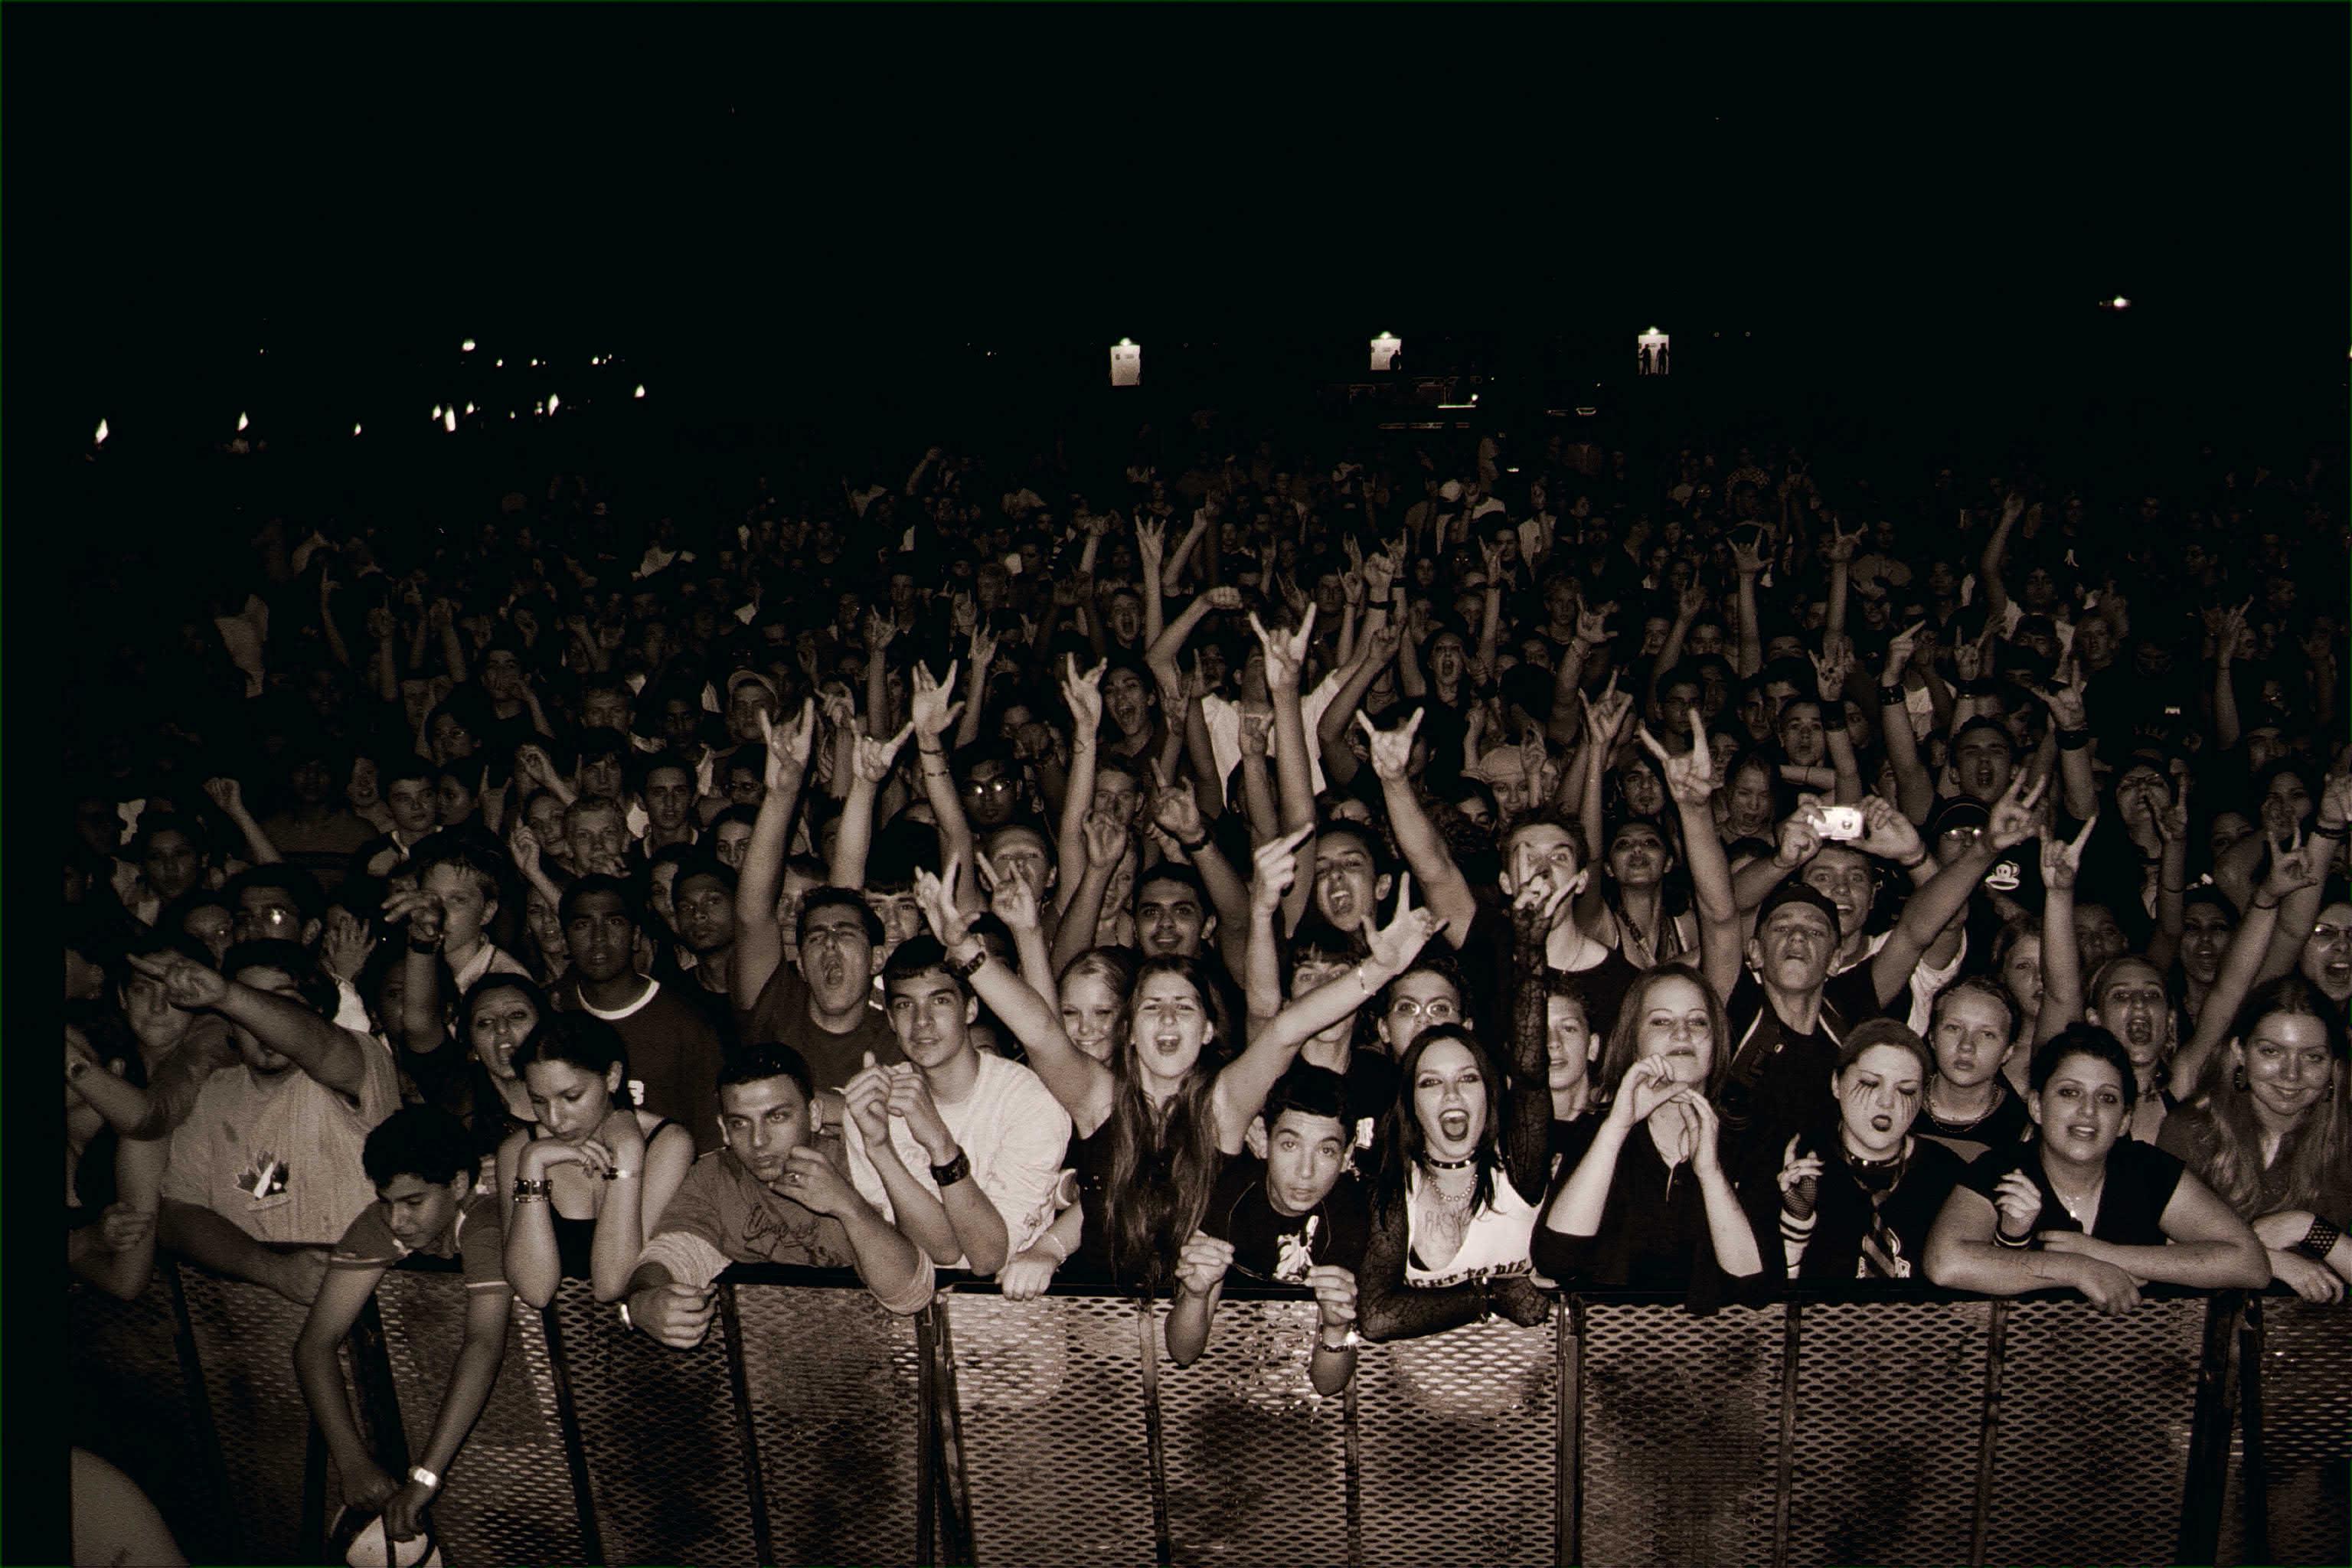 Desert Rock Crowd by Blodoffer 3072x2048